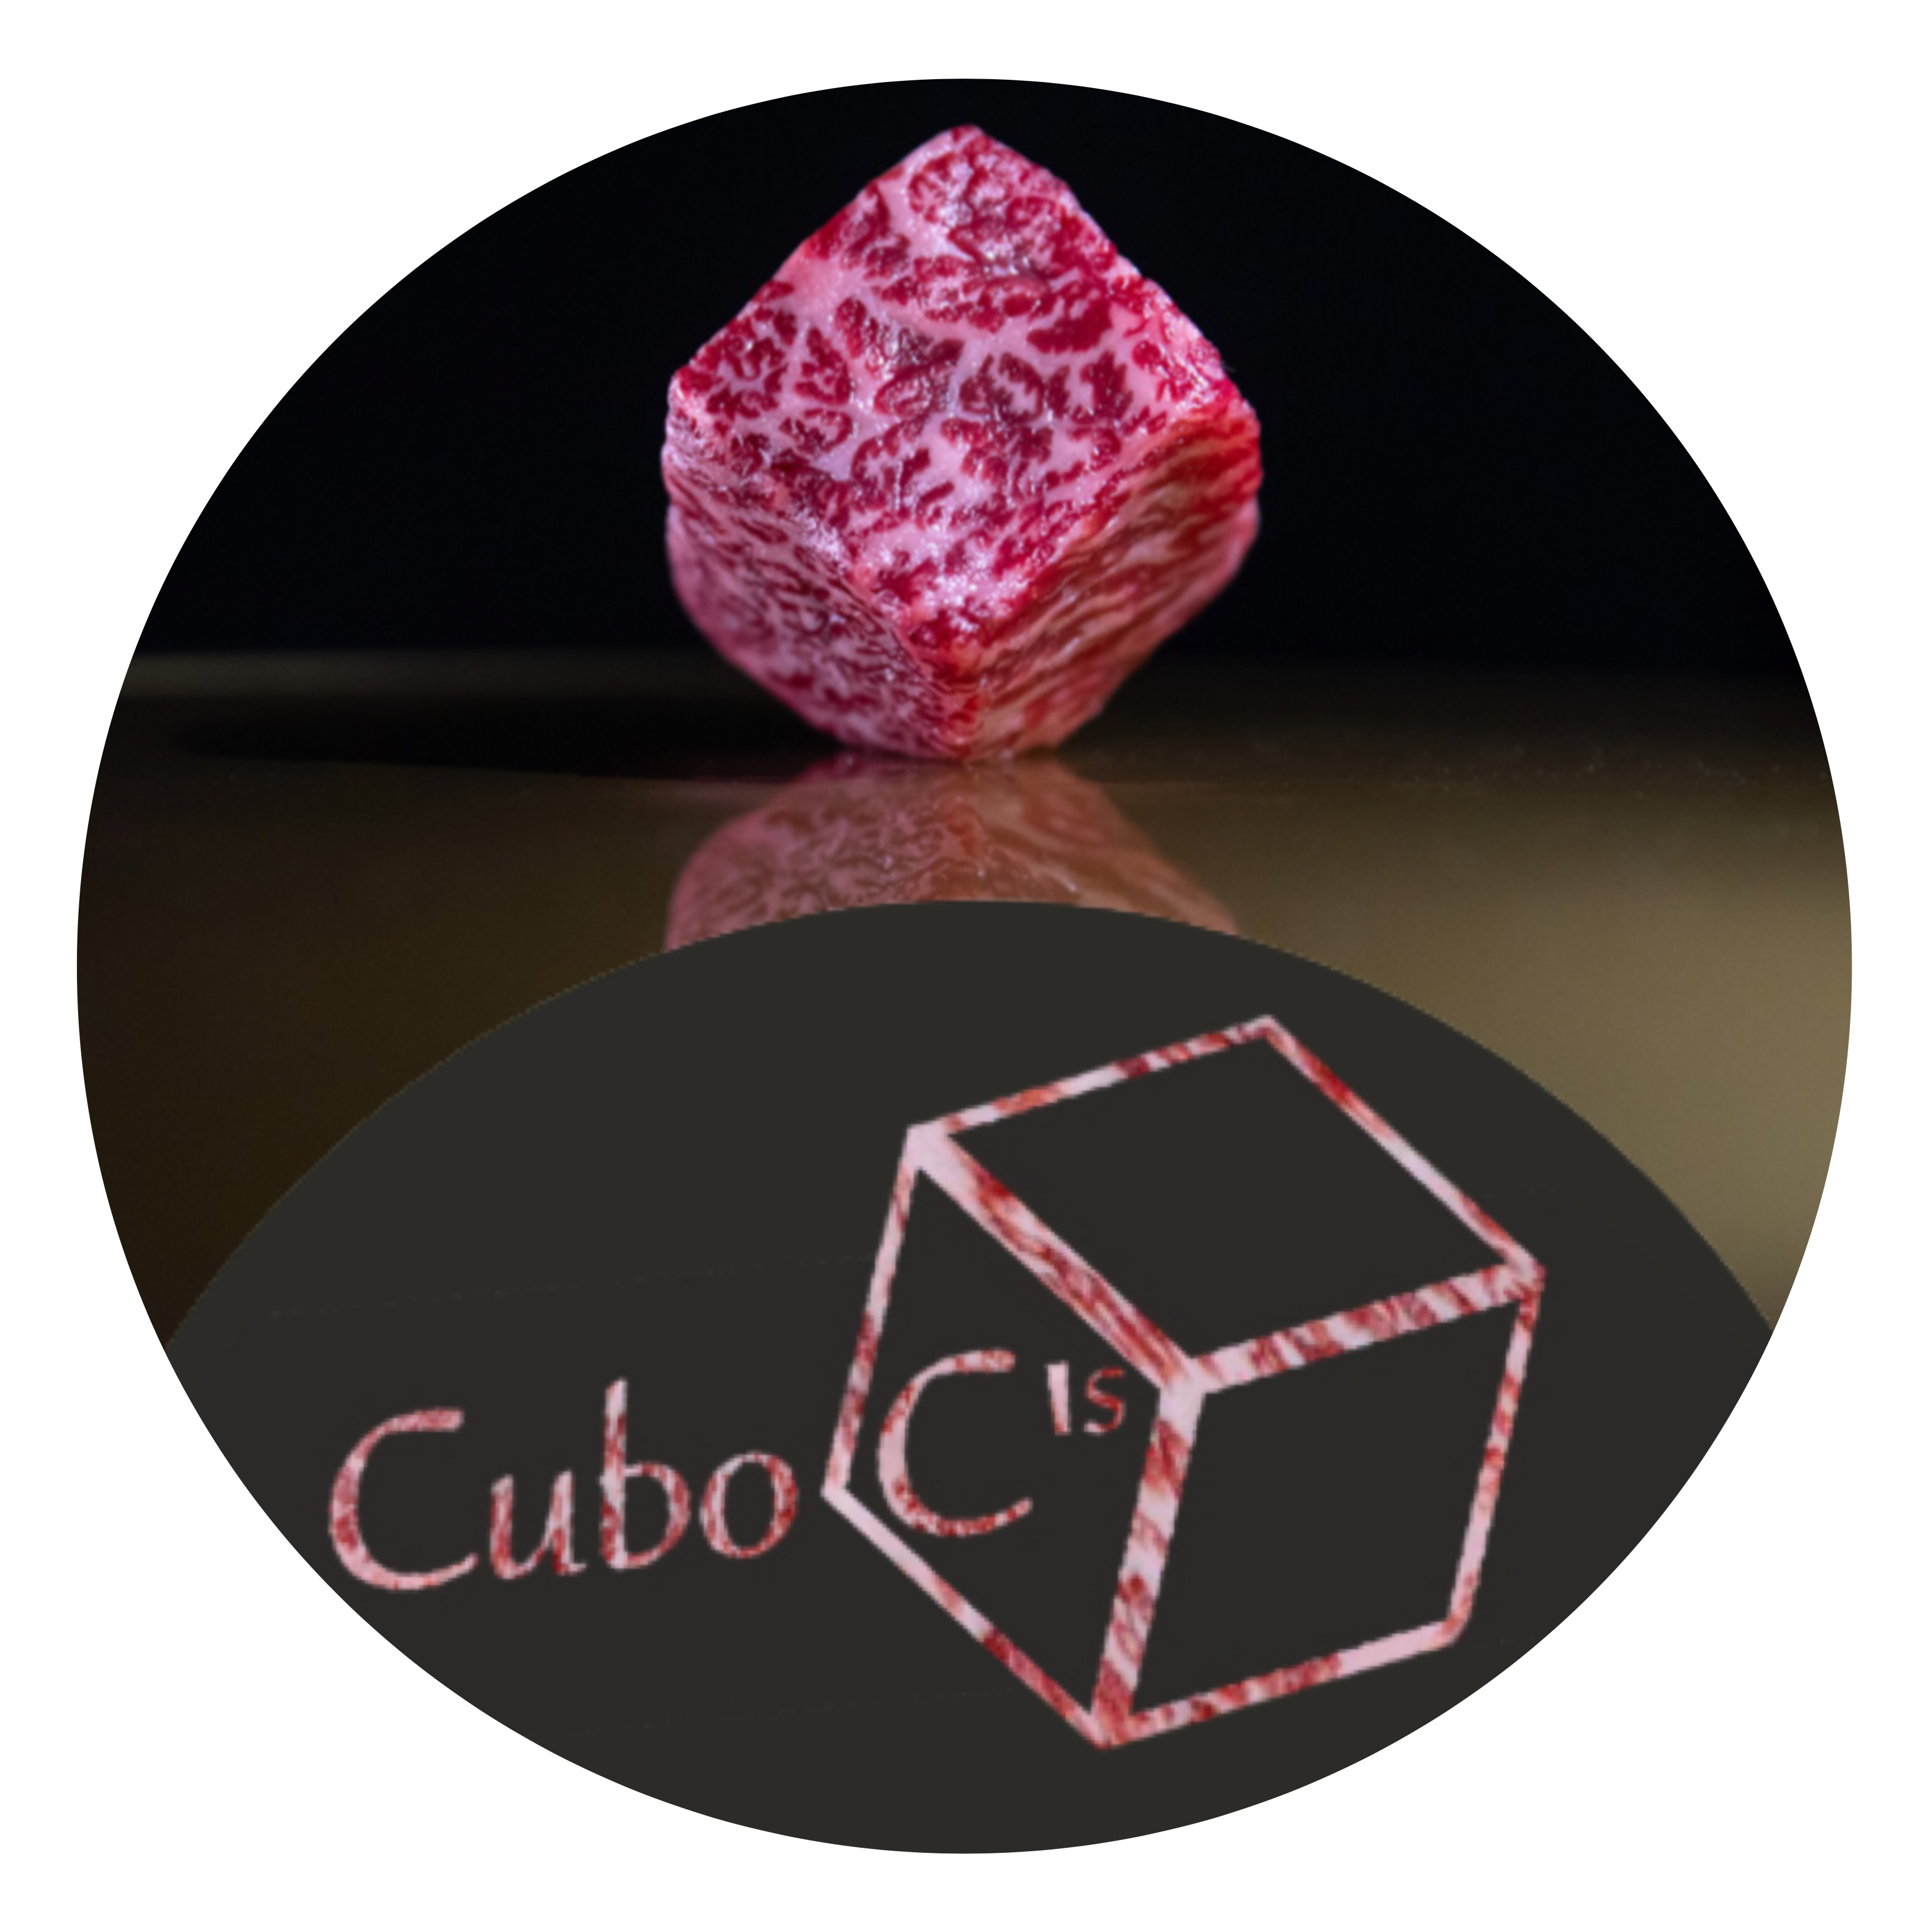 Cubo C'